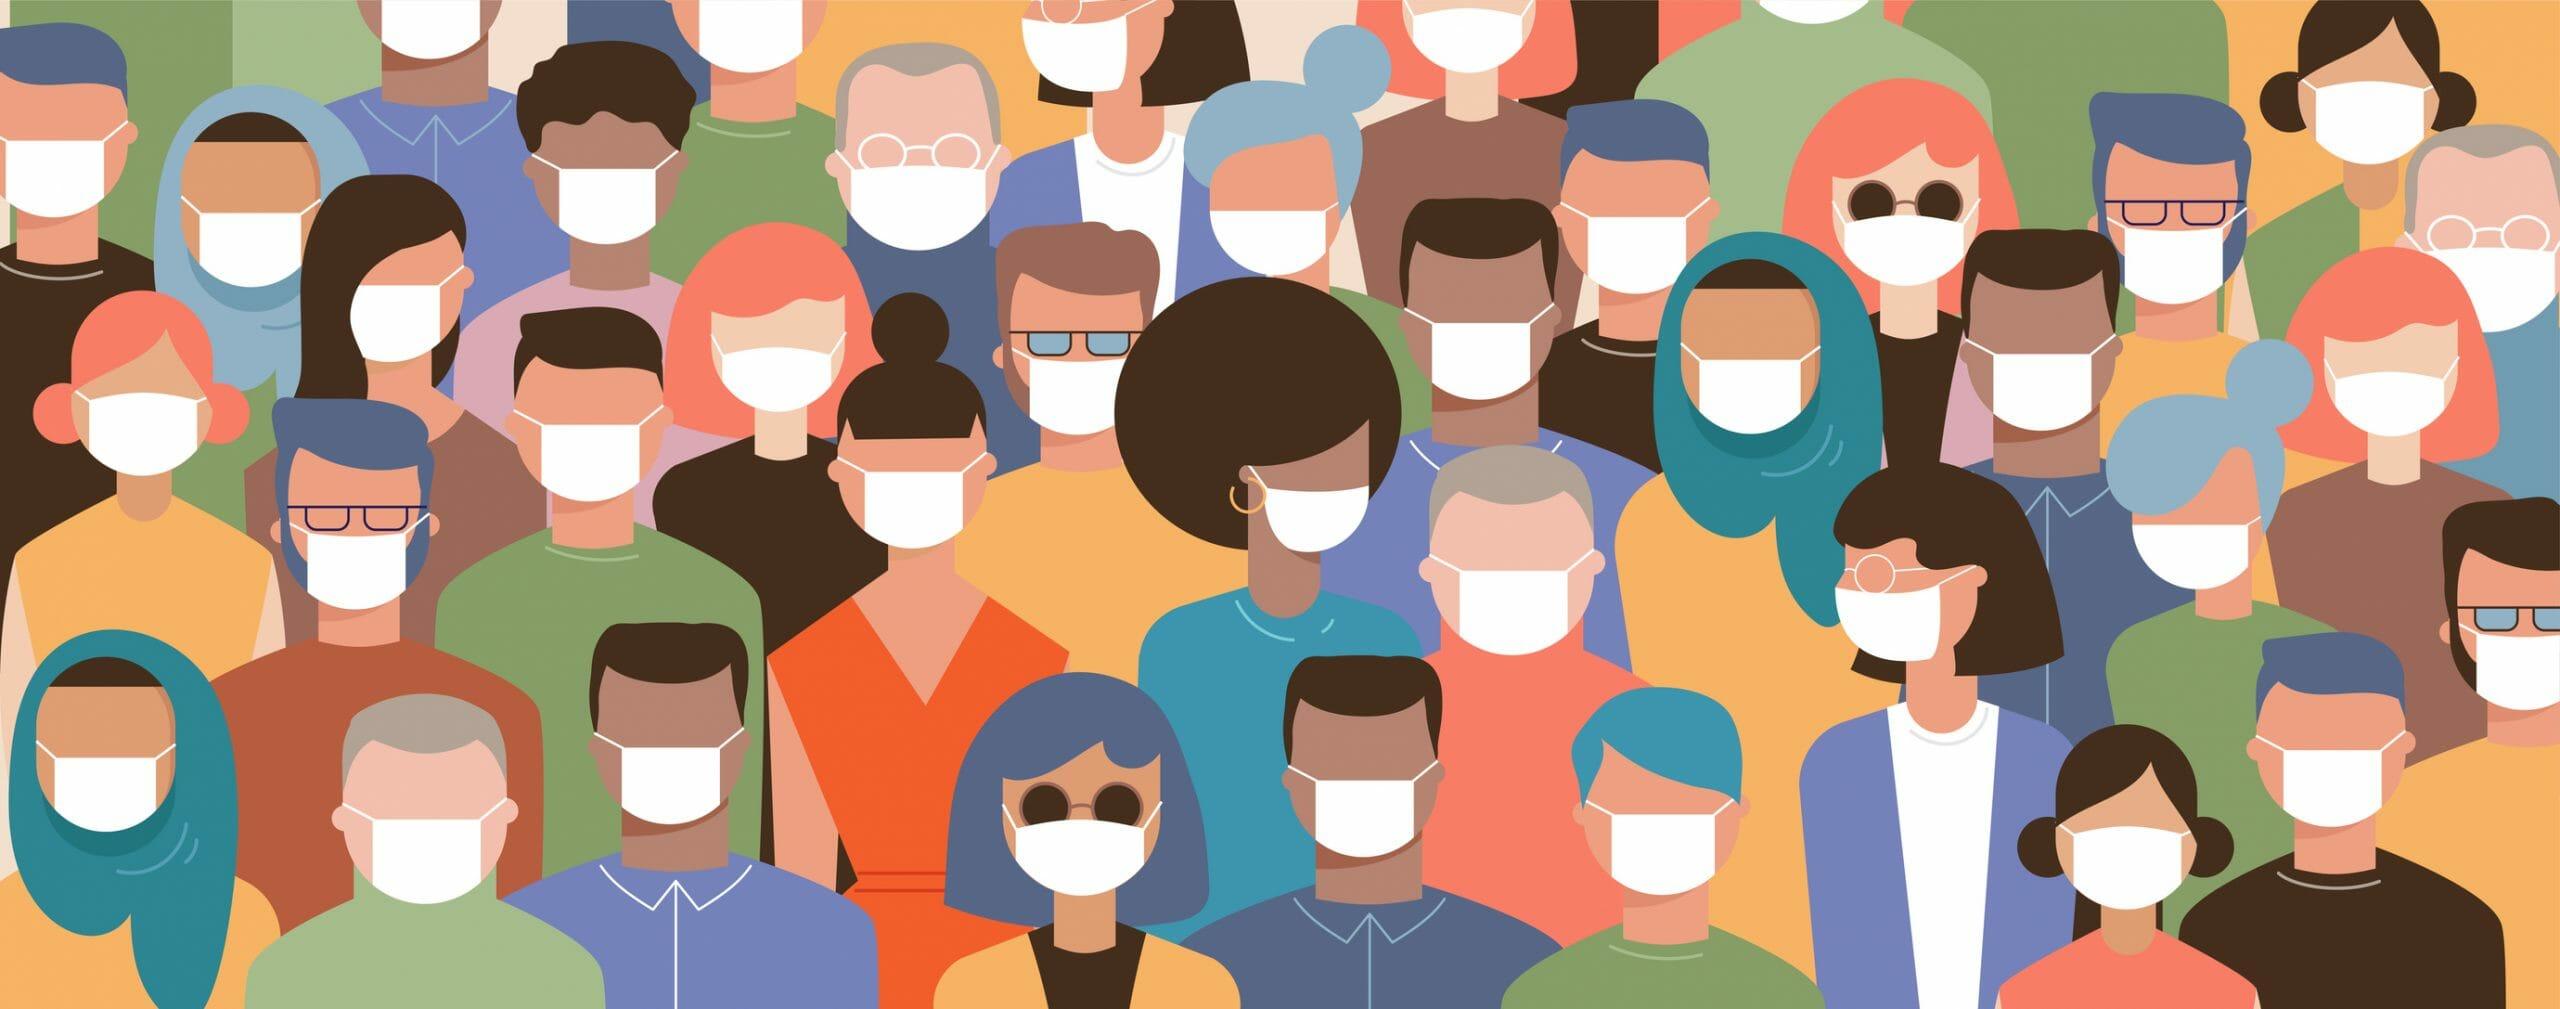 Illustration of a crowd wearing masks